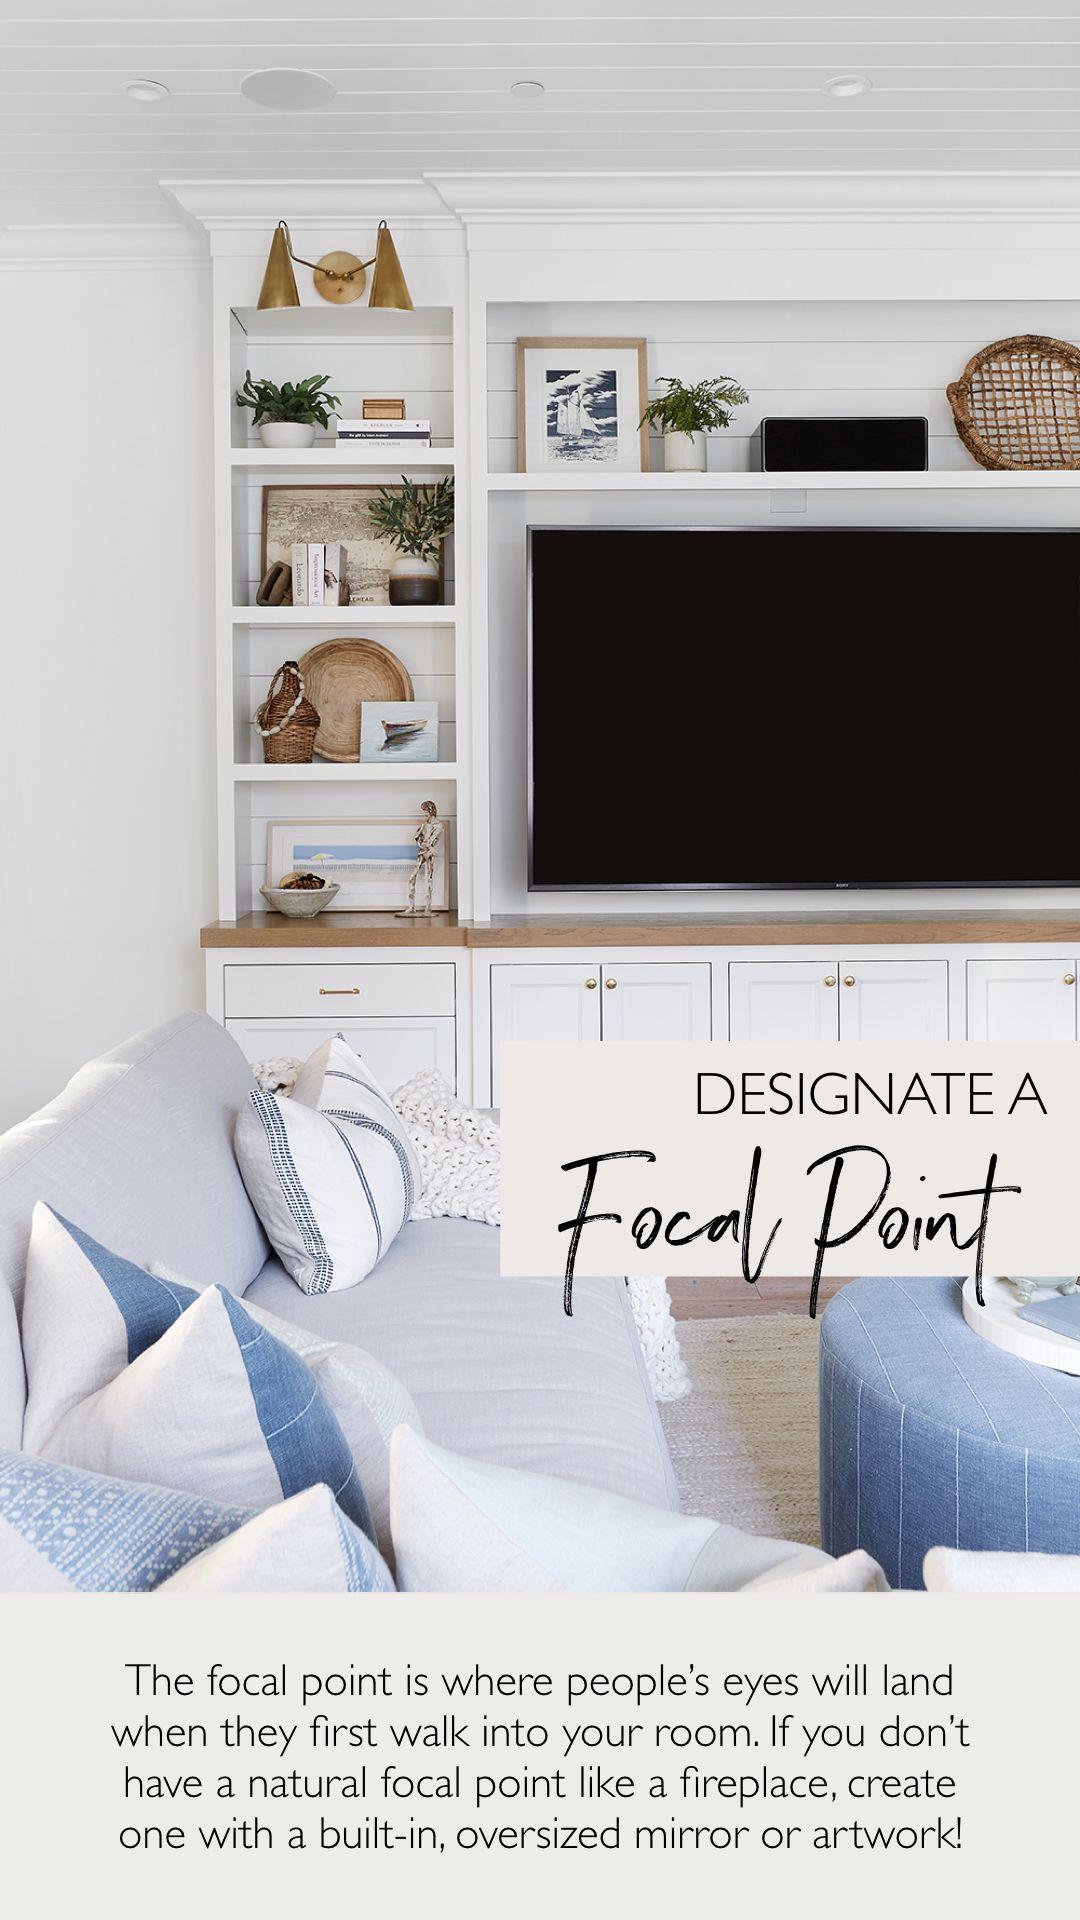 Living Room Essentials | INTERIOR DESIGN TIPS AND TRICK | #DesignTips #InteriorDesign #InteriorDesignTips #Tips #DecorTips #DesignGuide #InteriorDesignGuide #HomeDecor #livingroomessentials